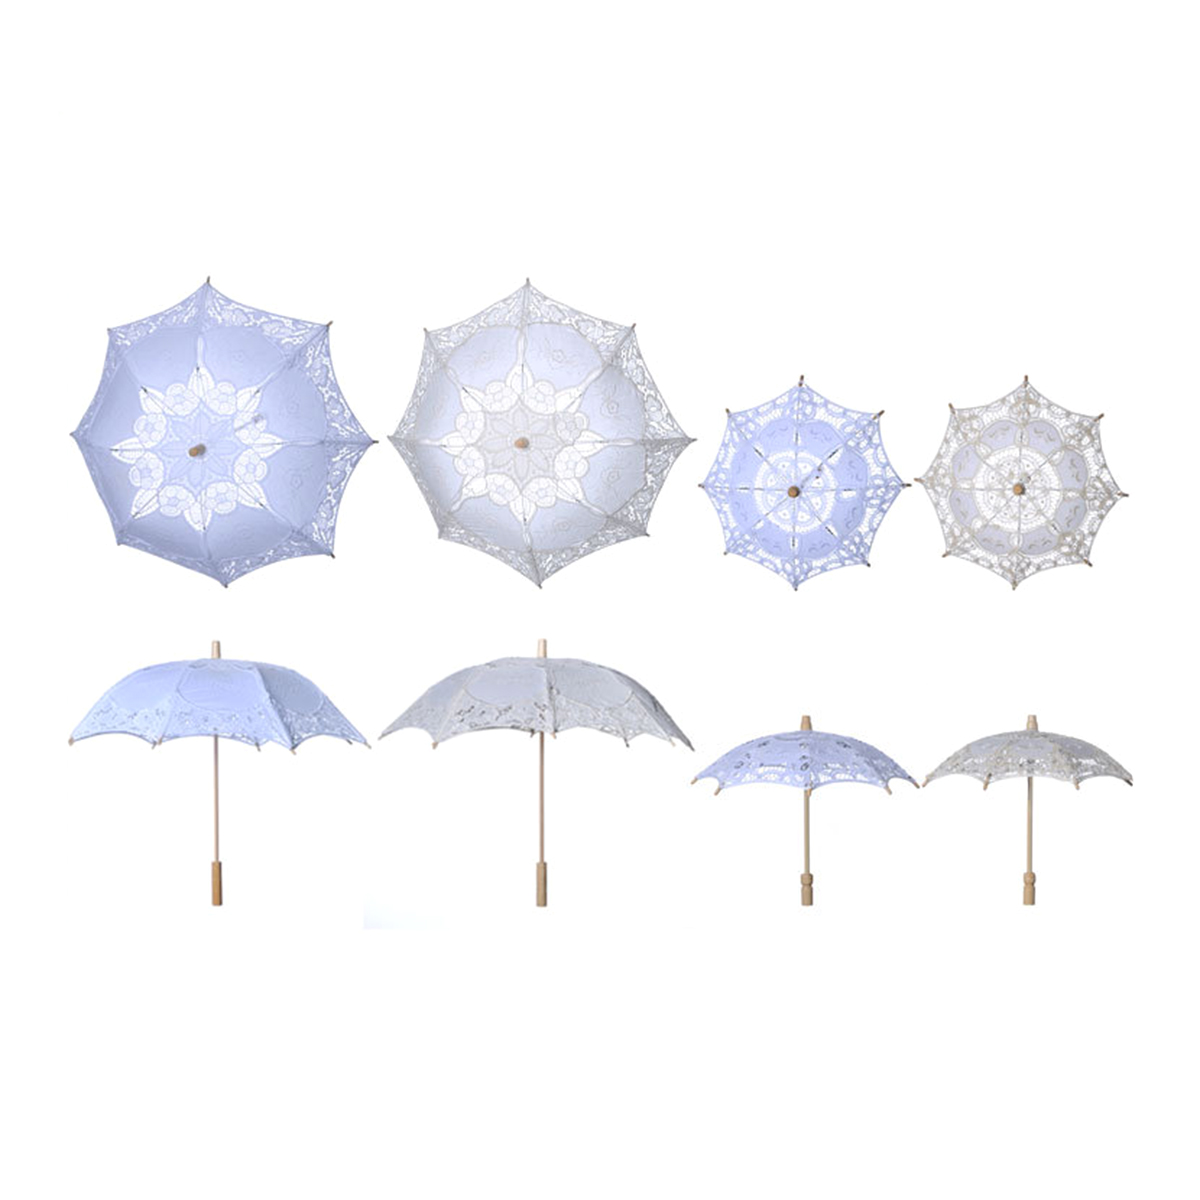 Image 4 - Bridal Wedding Umbrella Lace Cotton Embroidery Handmade Parasol Umbrella For Wedding Romantic Photo Props L Size 60cmBridal Umbrellas   -